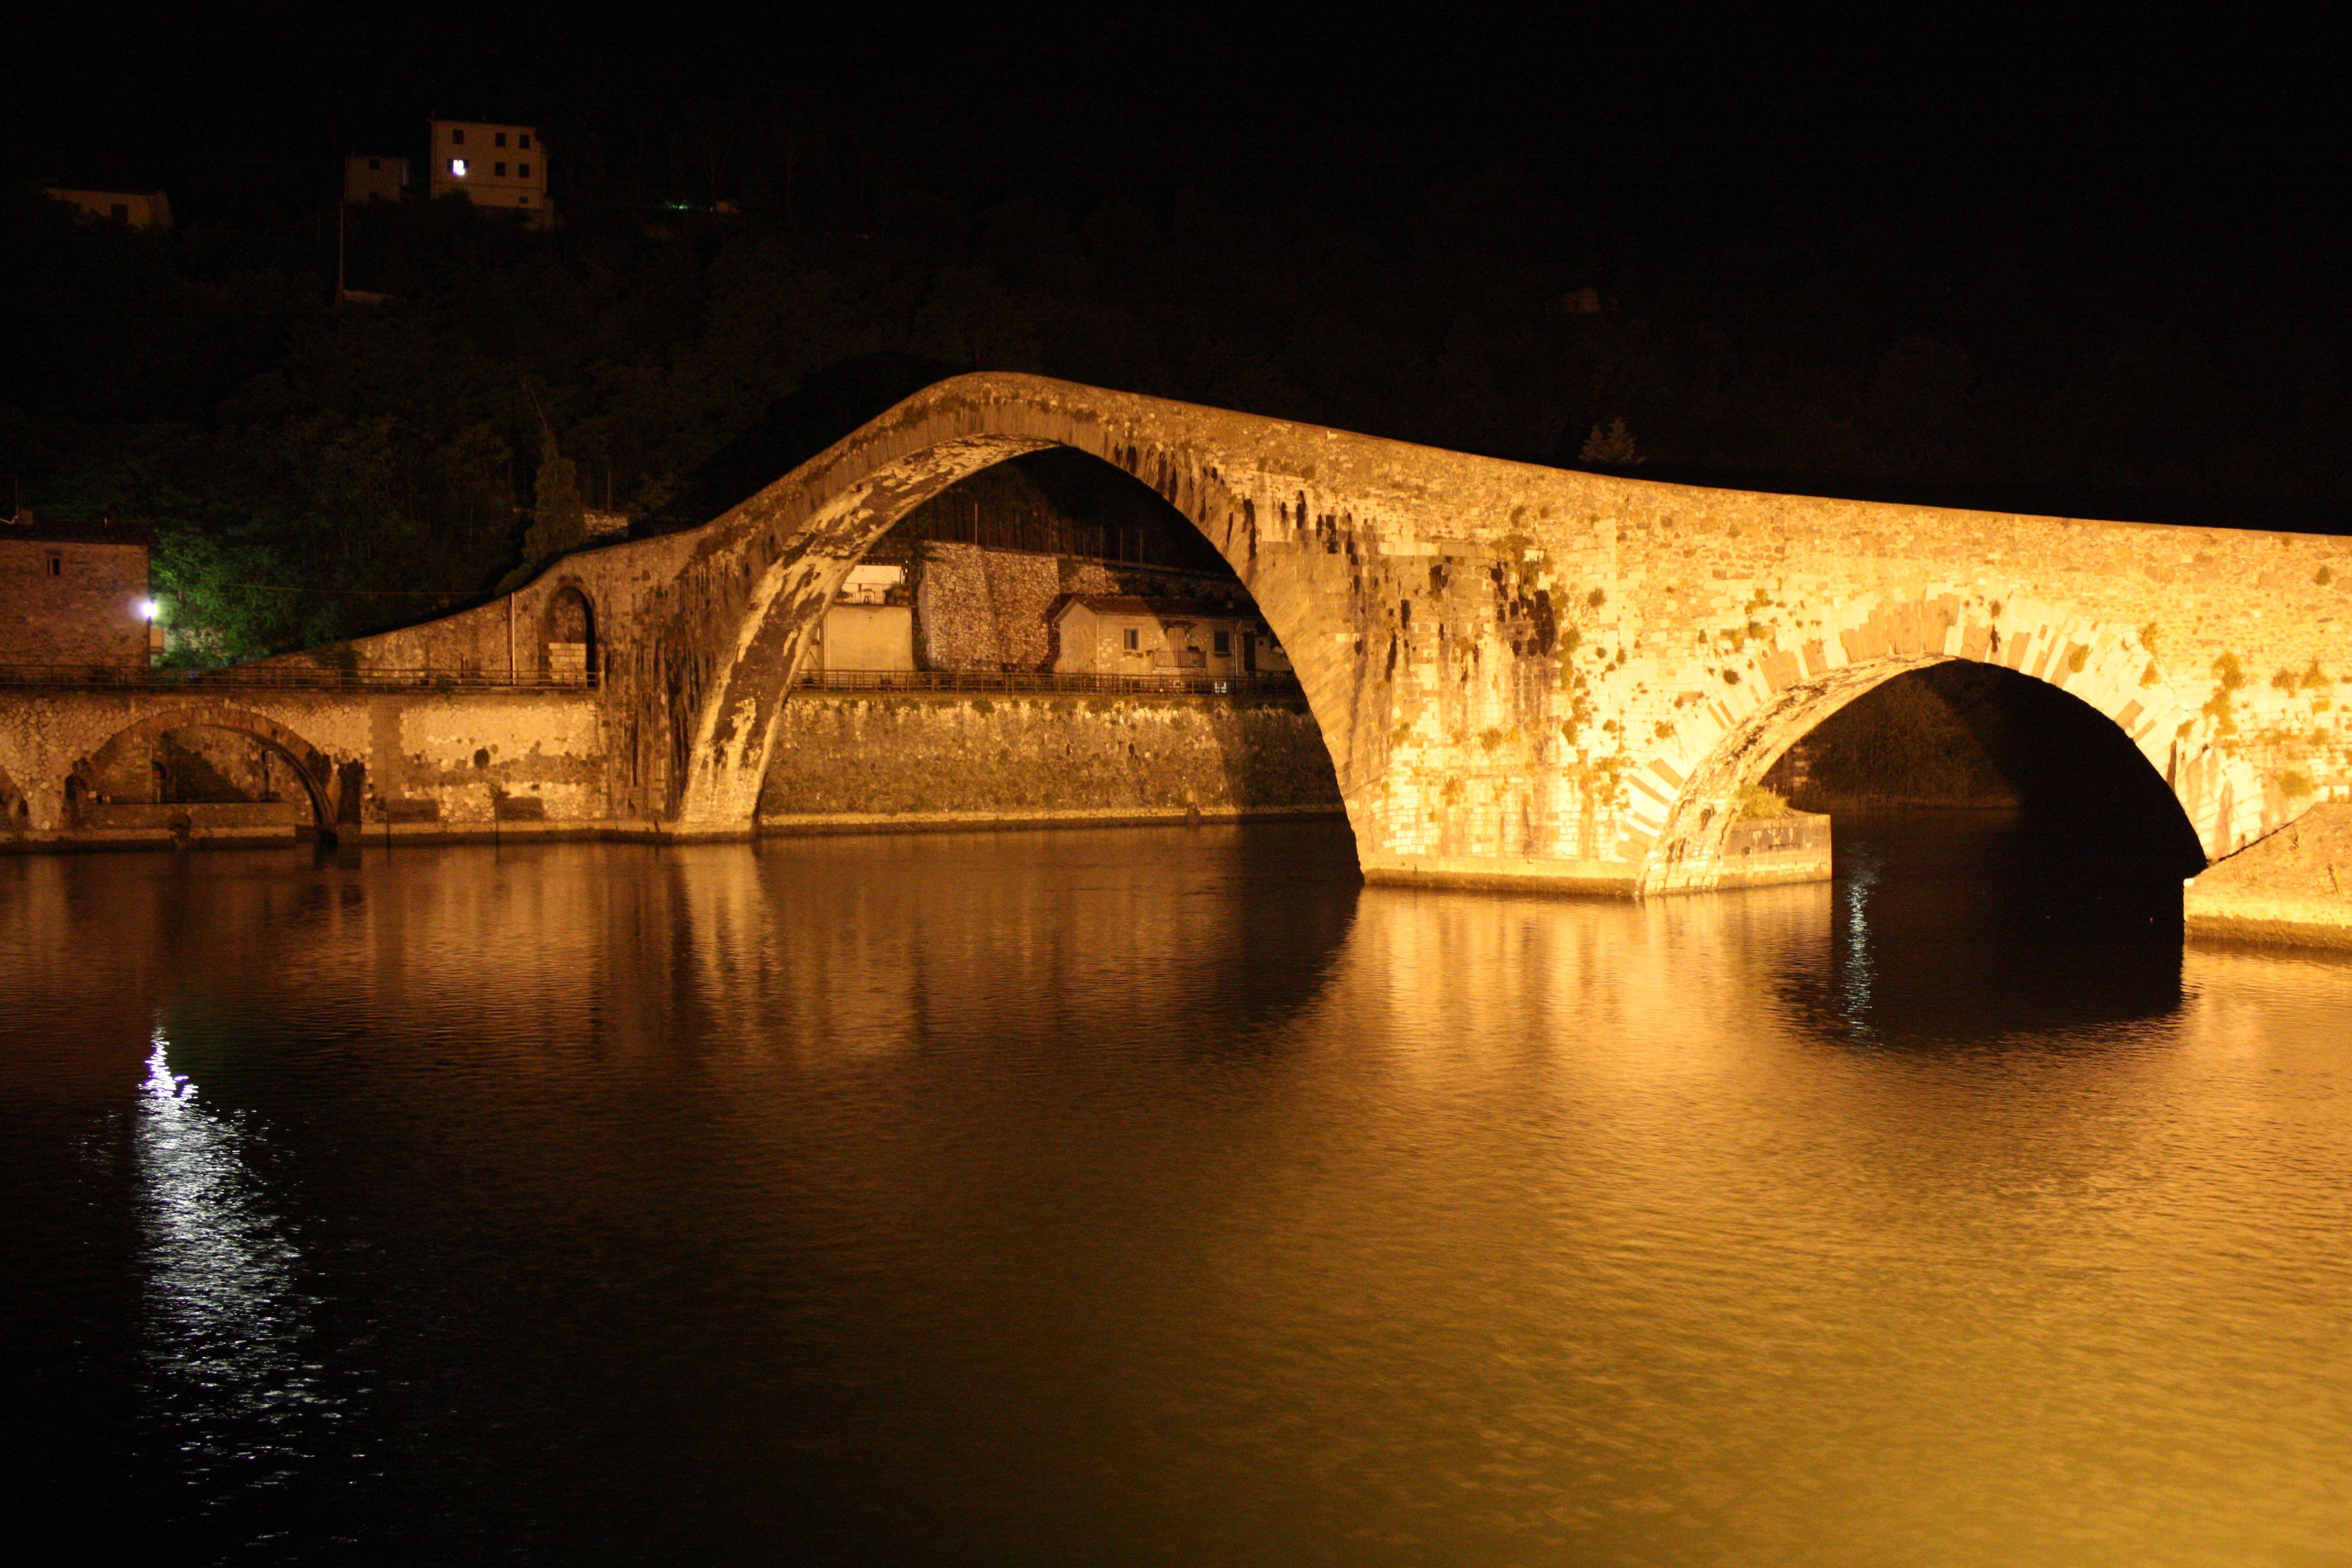 Il ponte del diavolo Garfagnana